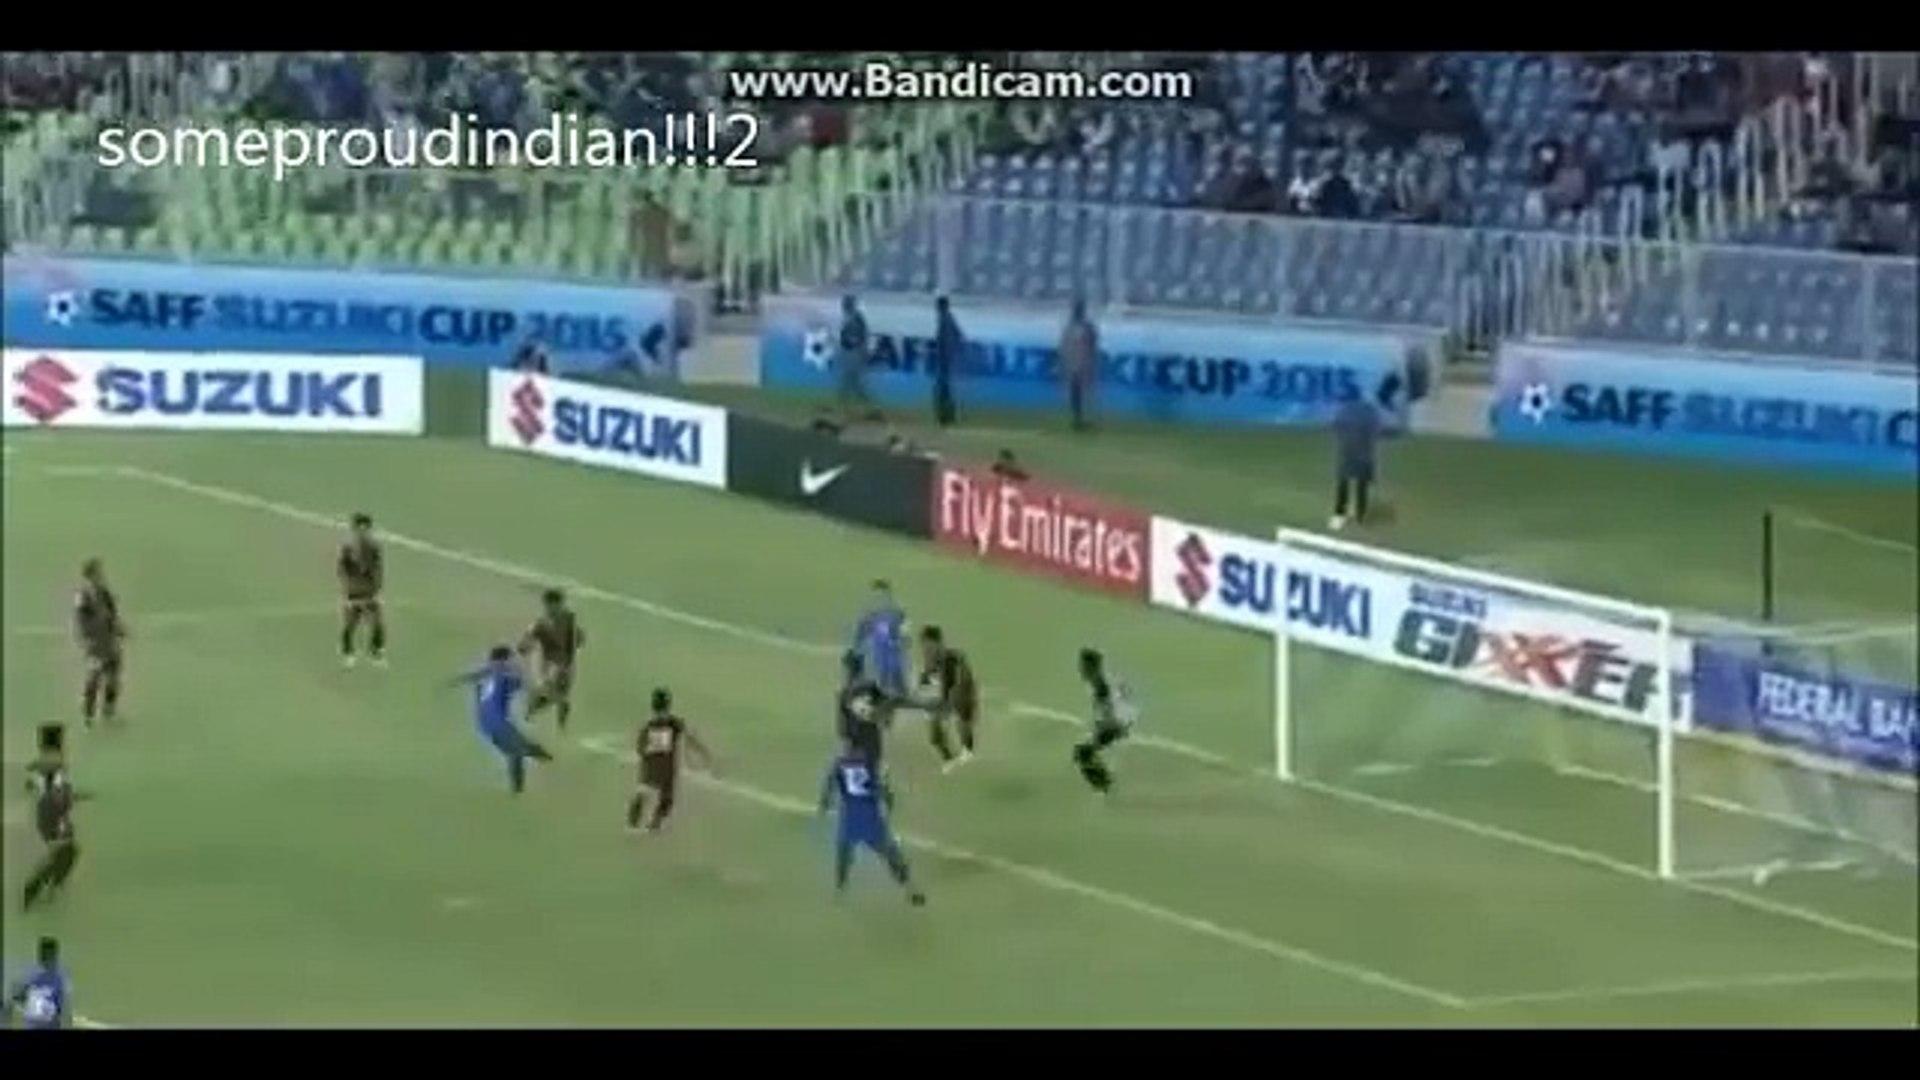 India vs Sri Lanka 2-0, SAFF Suzuki Cup 2015: Highlights of all Goals India  wins!!!